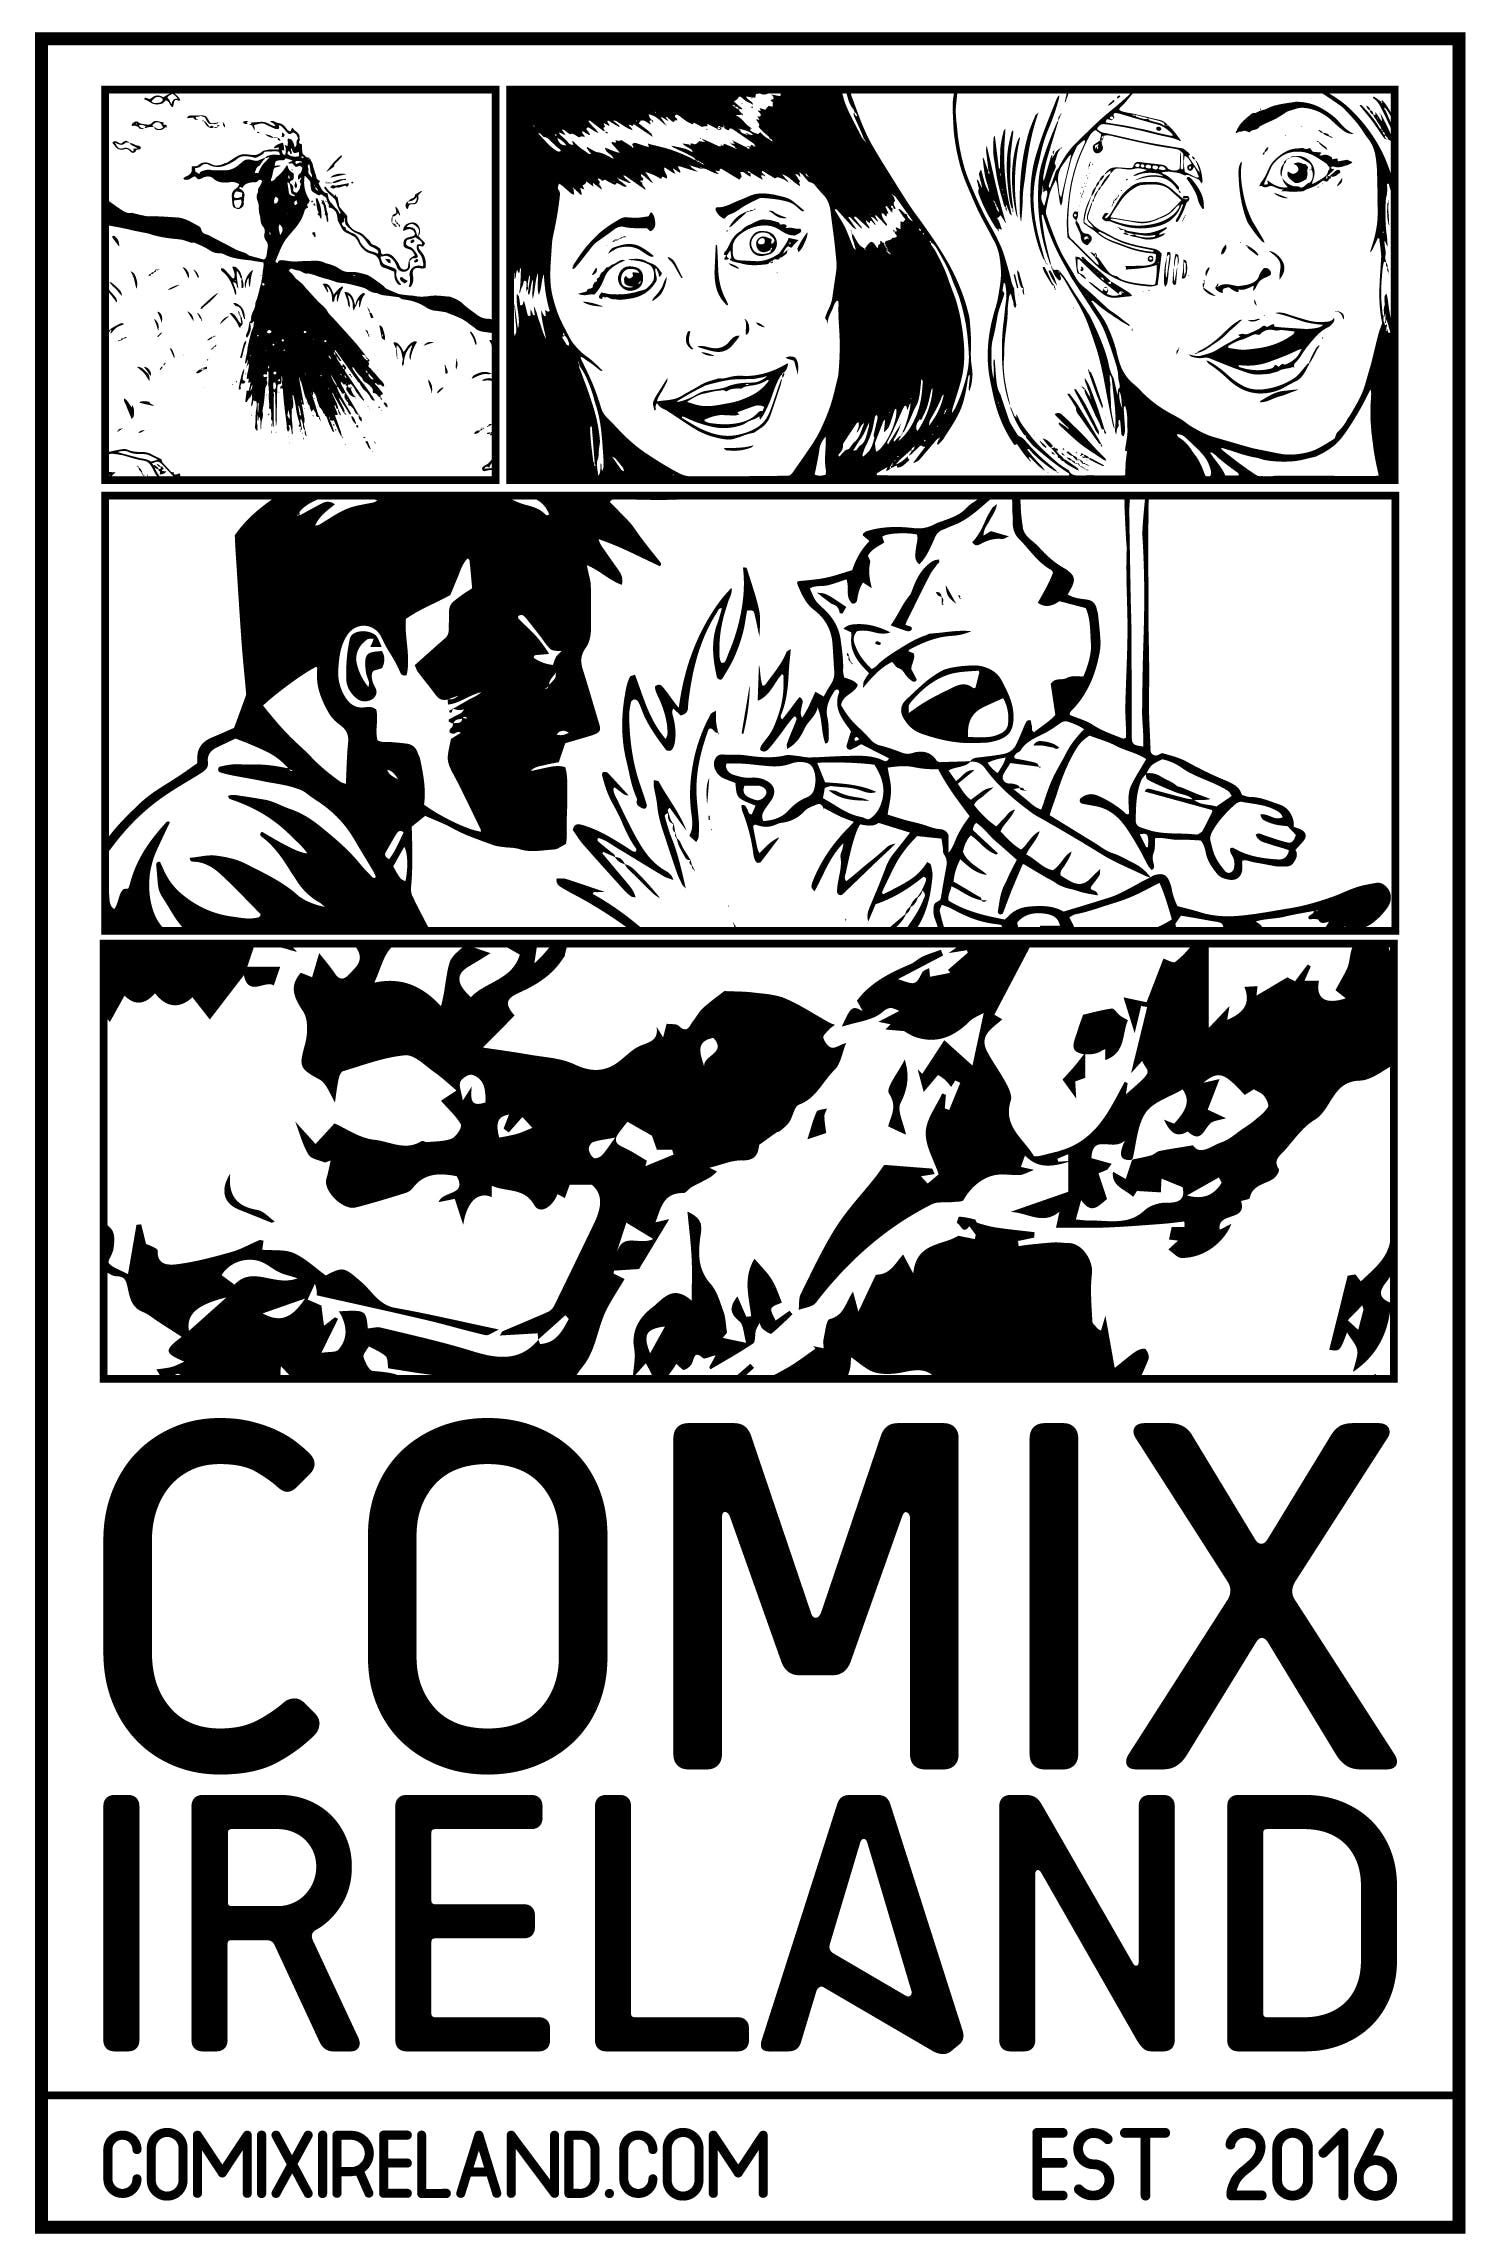 Comix Ireland